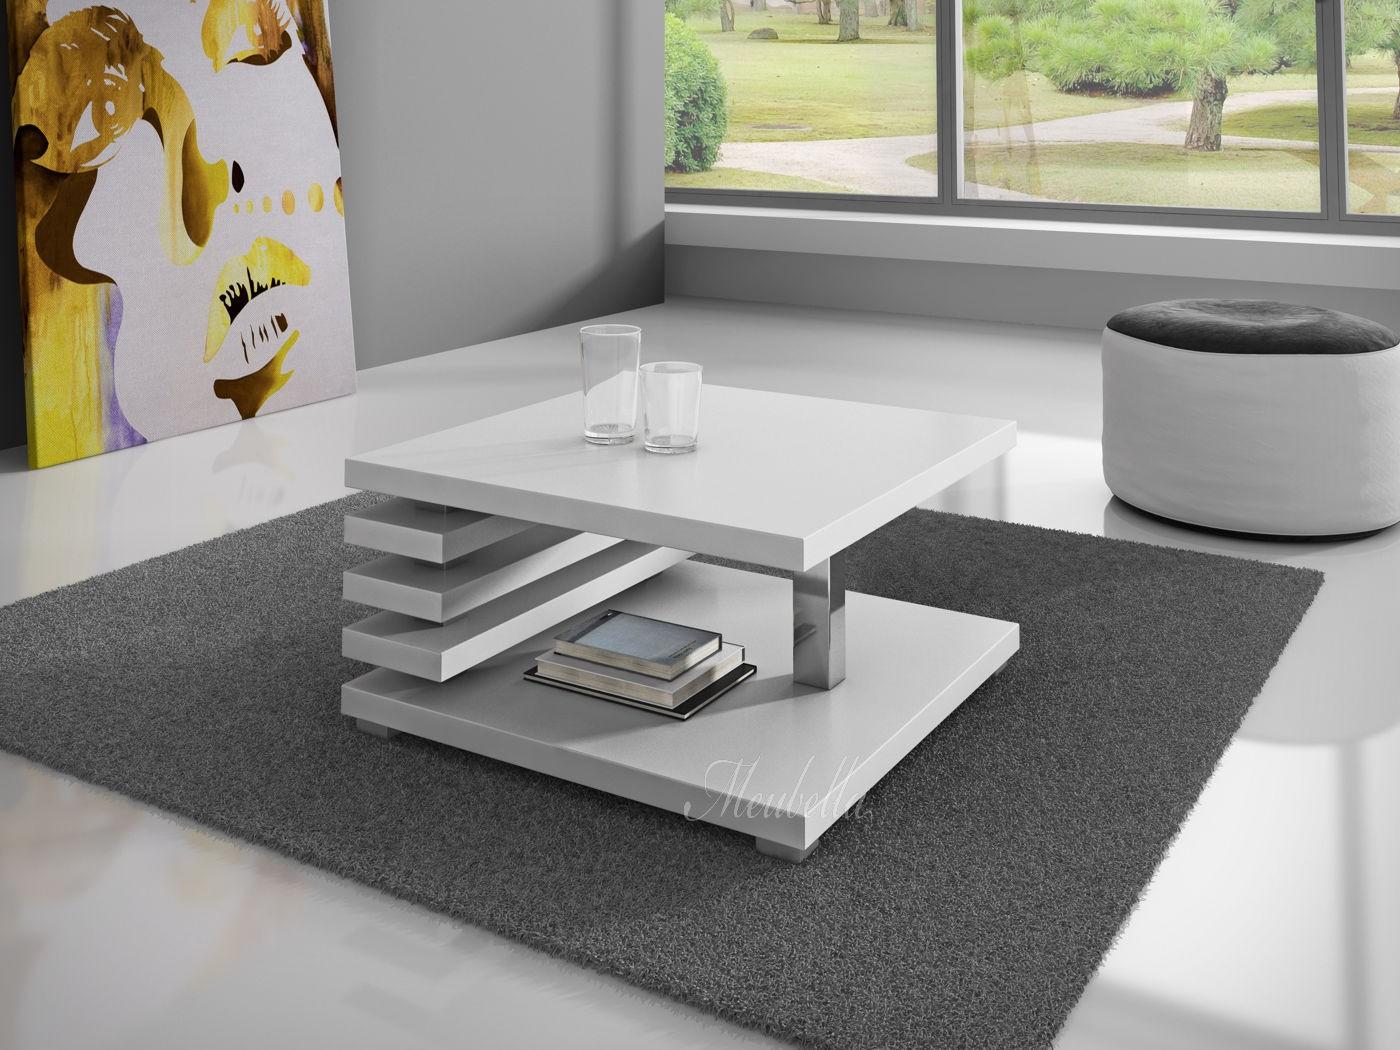 Salontafel koya wit salontafels overig woonkamer meubella - Wat op een salontafel ...